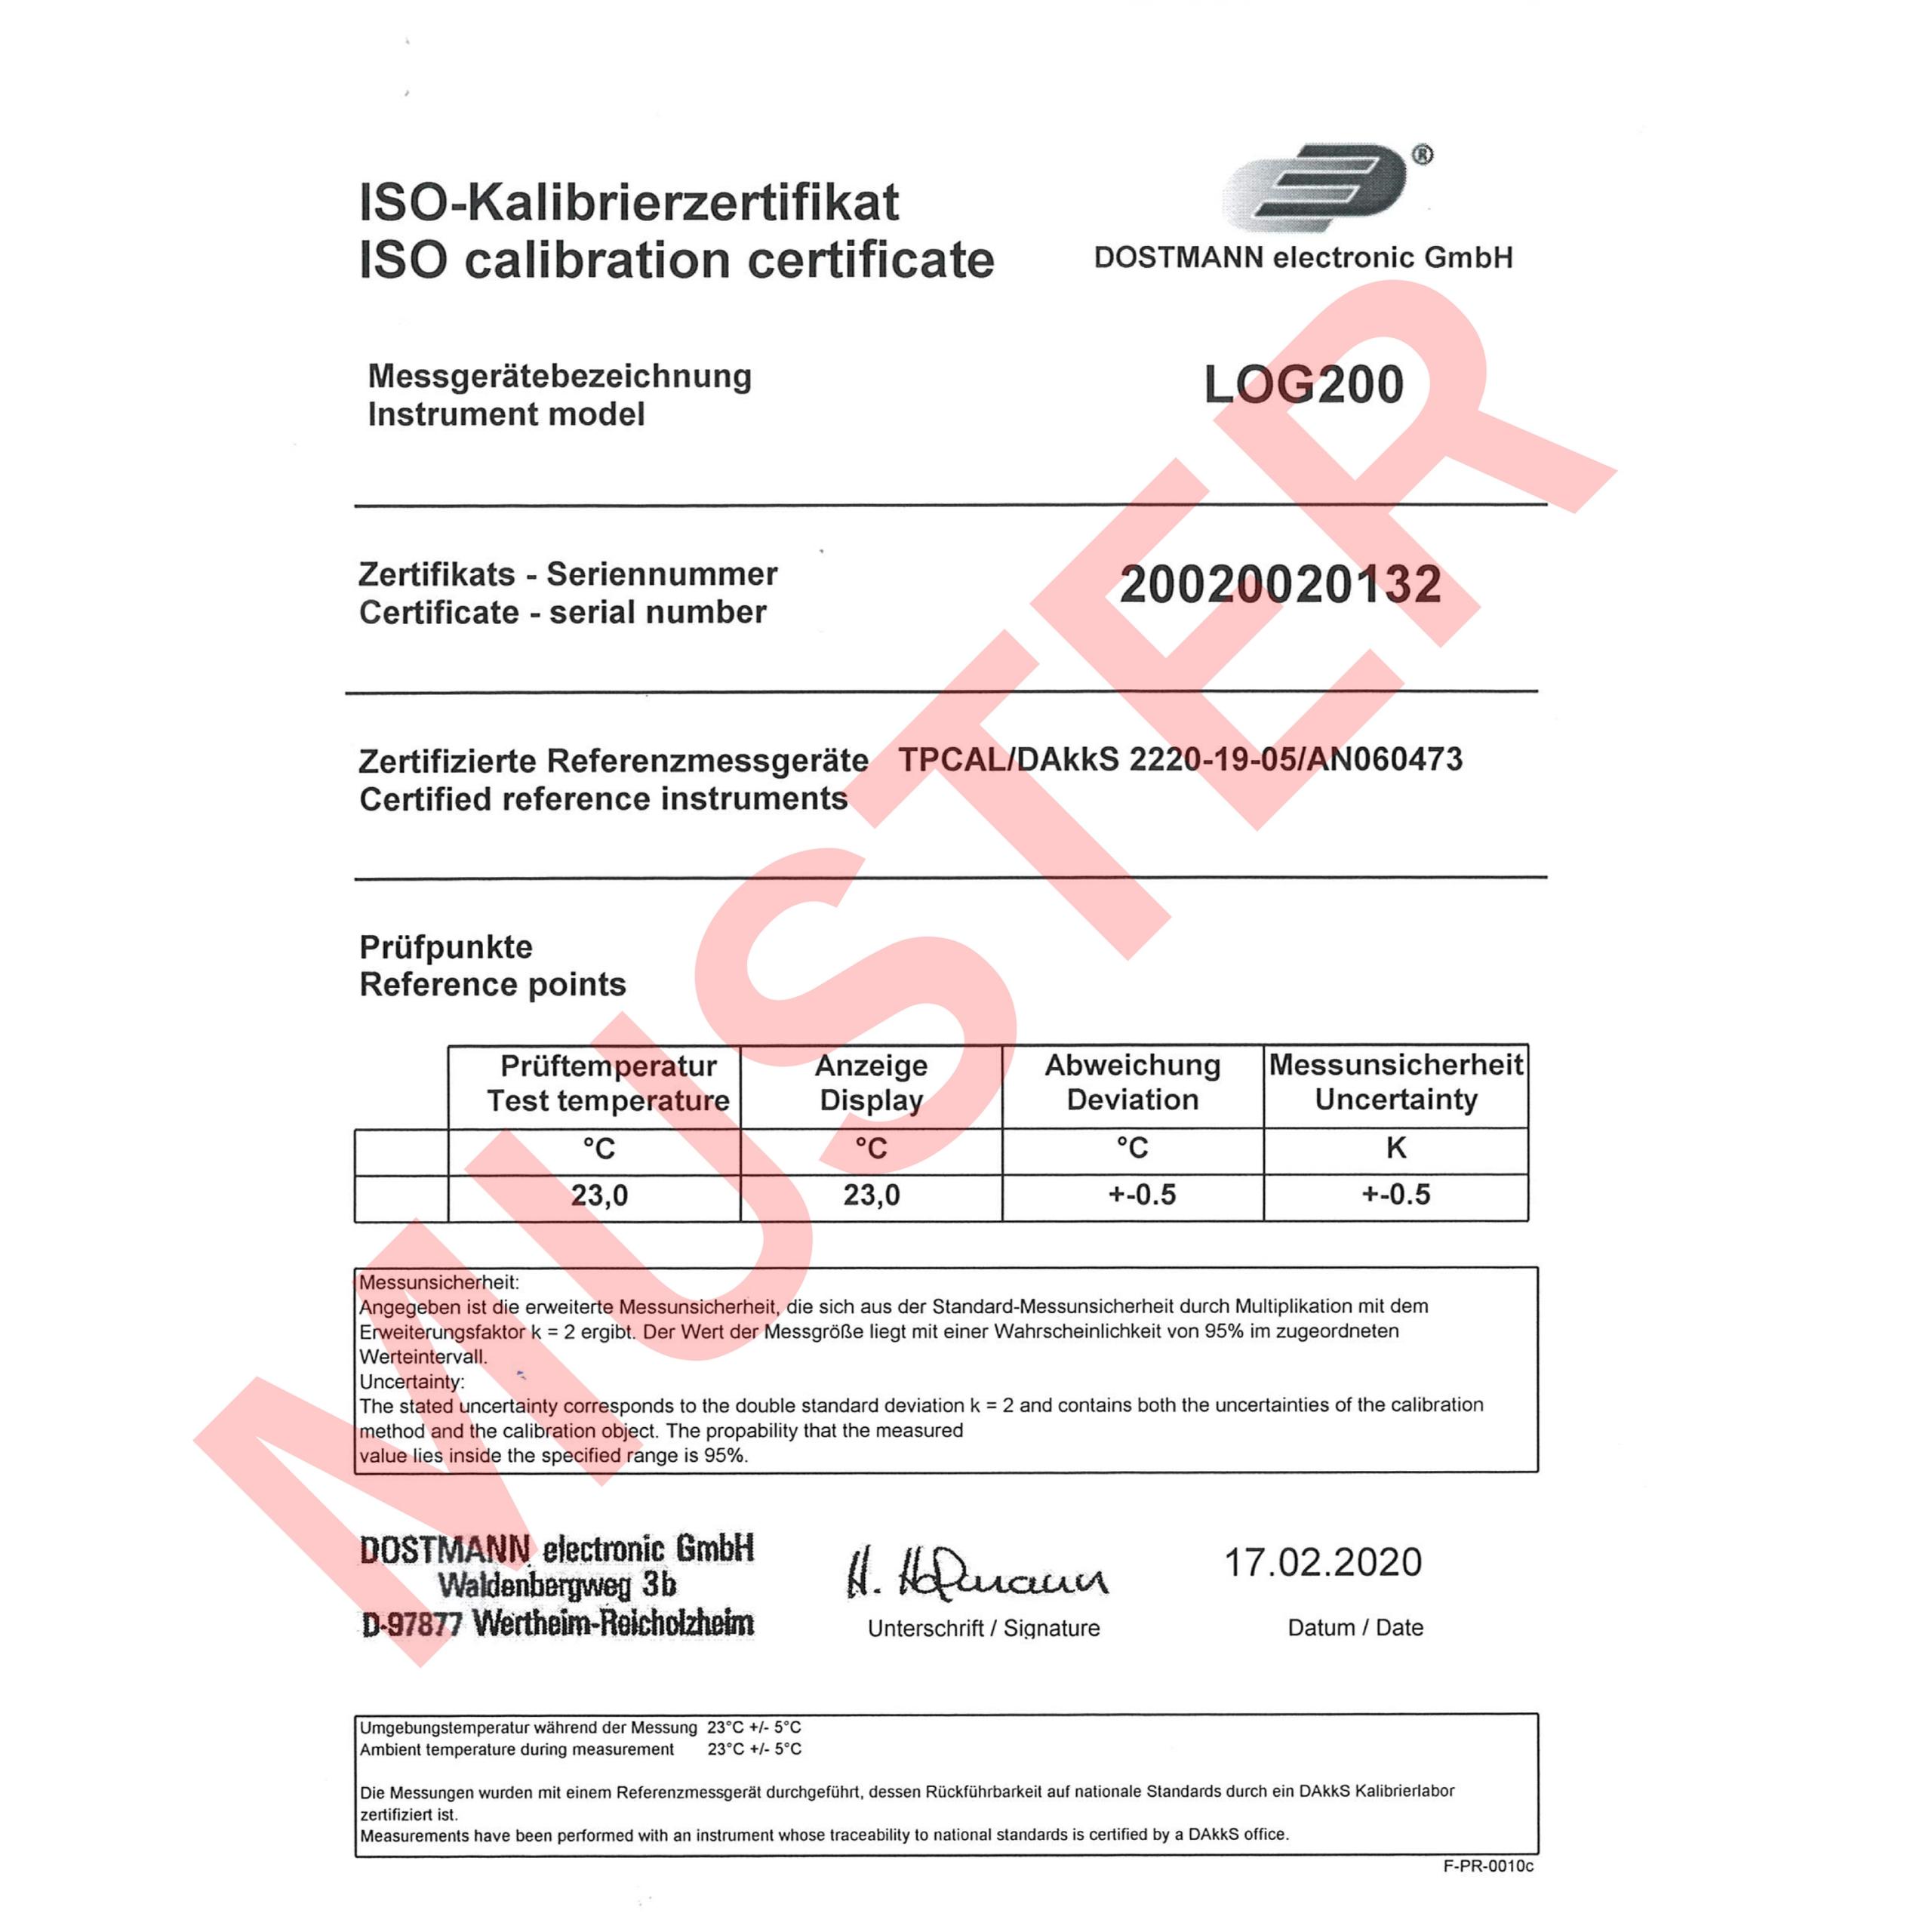 Zertifikat Muster Artikelnummer 31105702.jpg